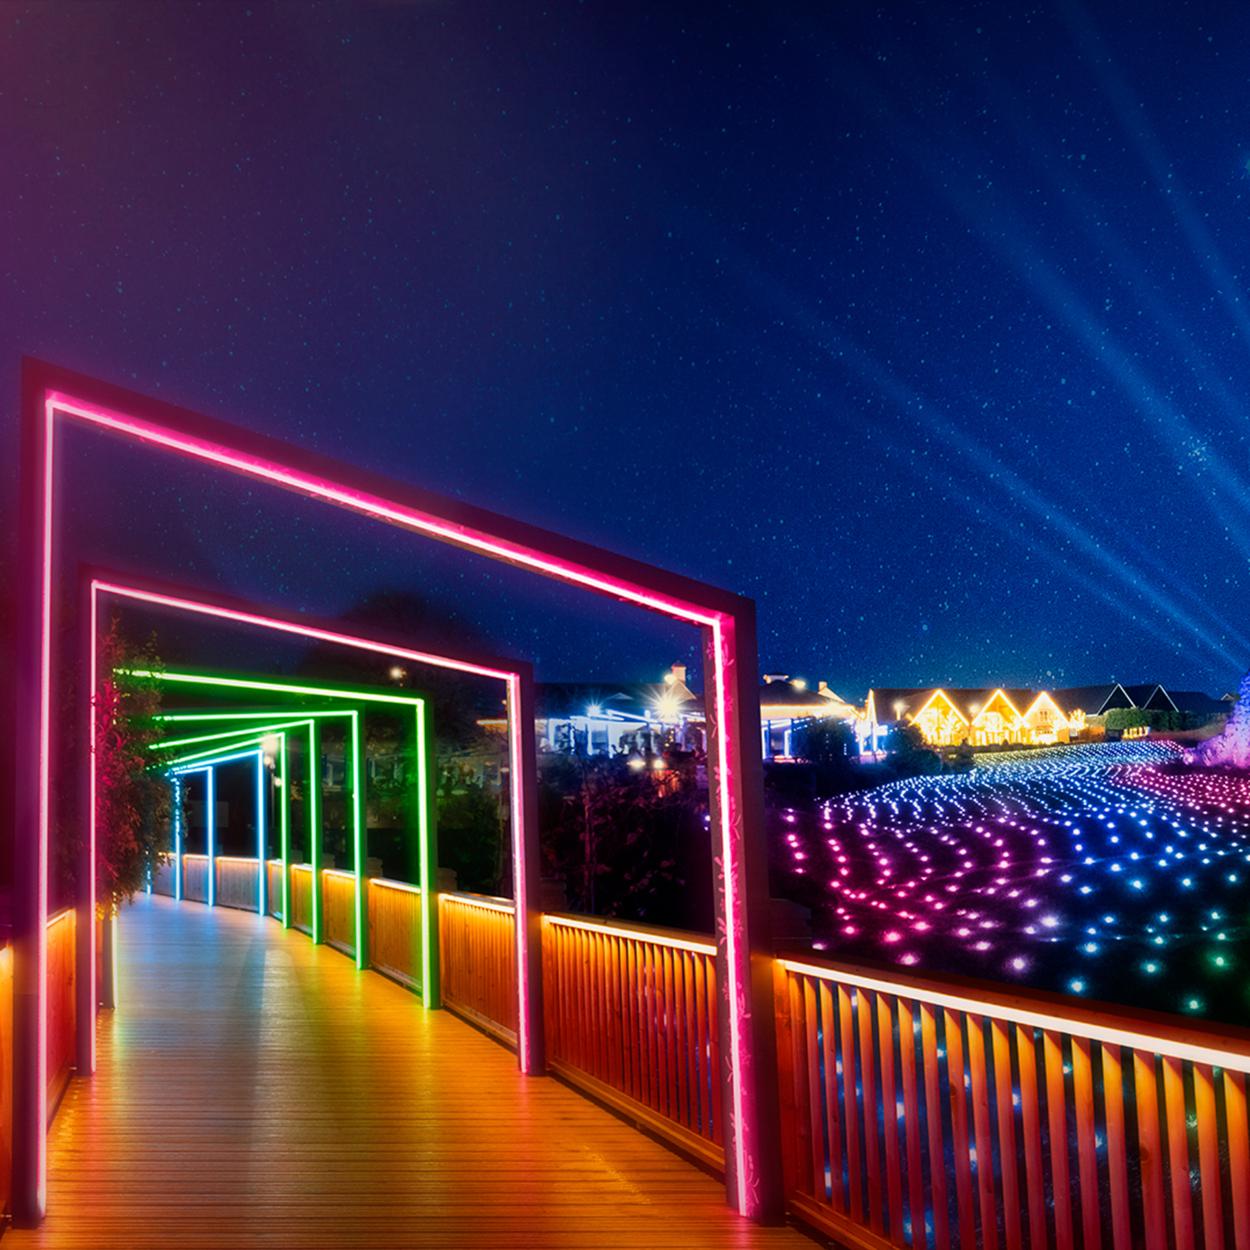 Field of lights archway